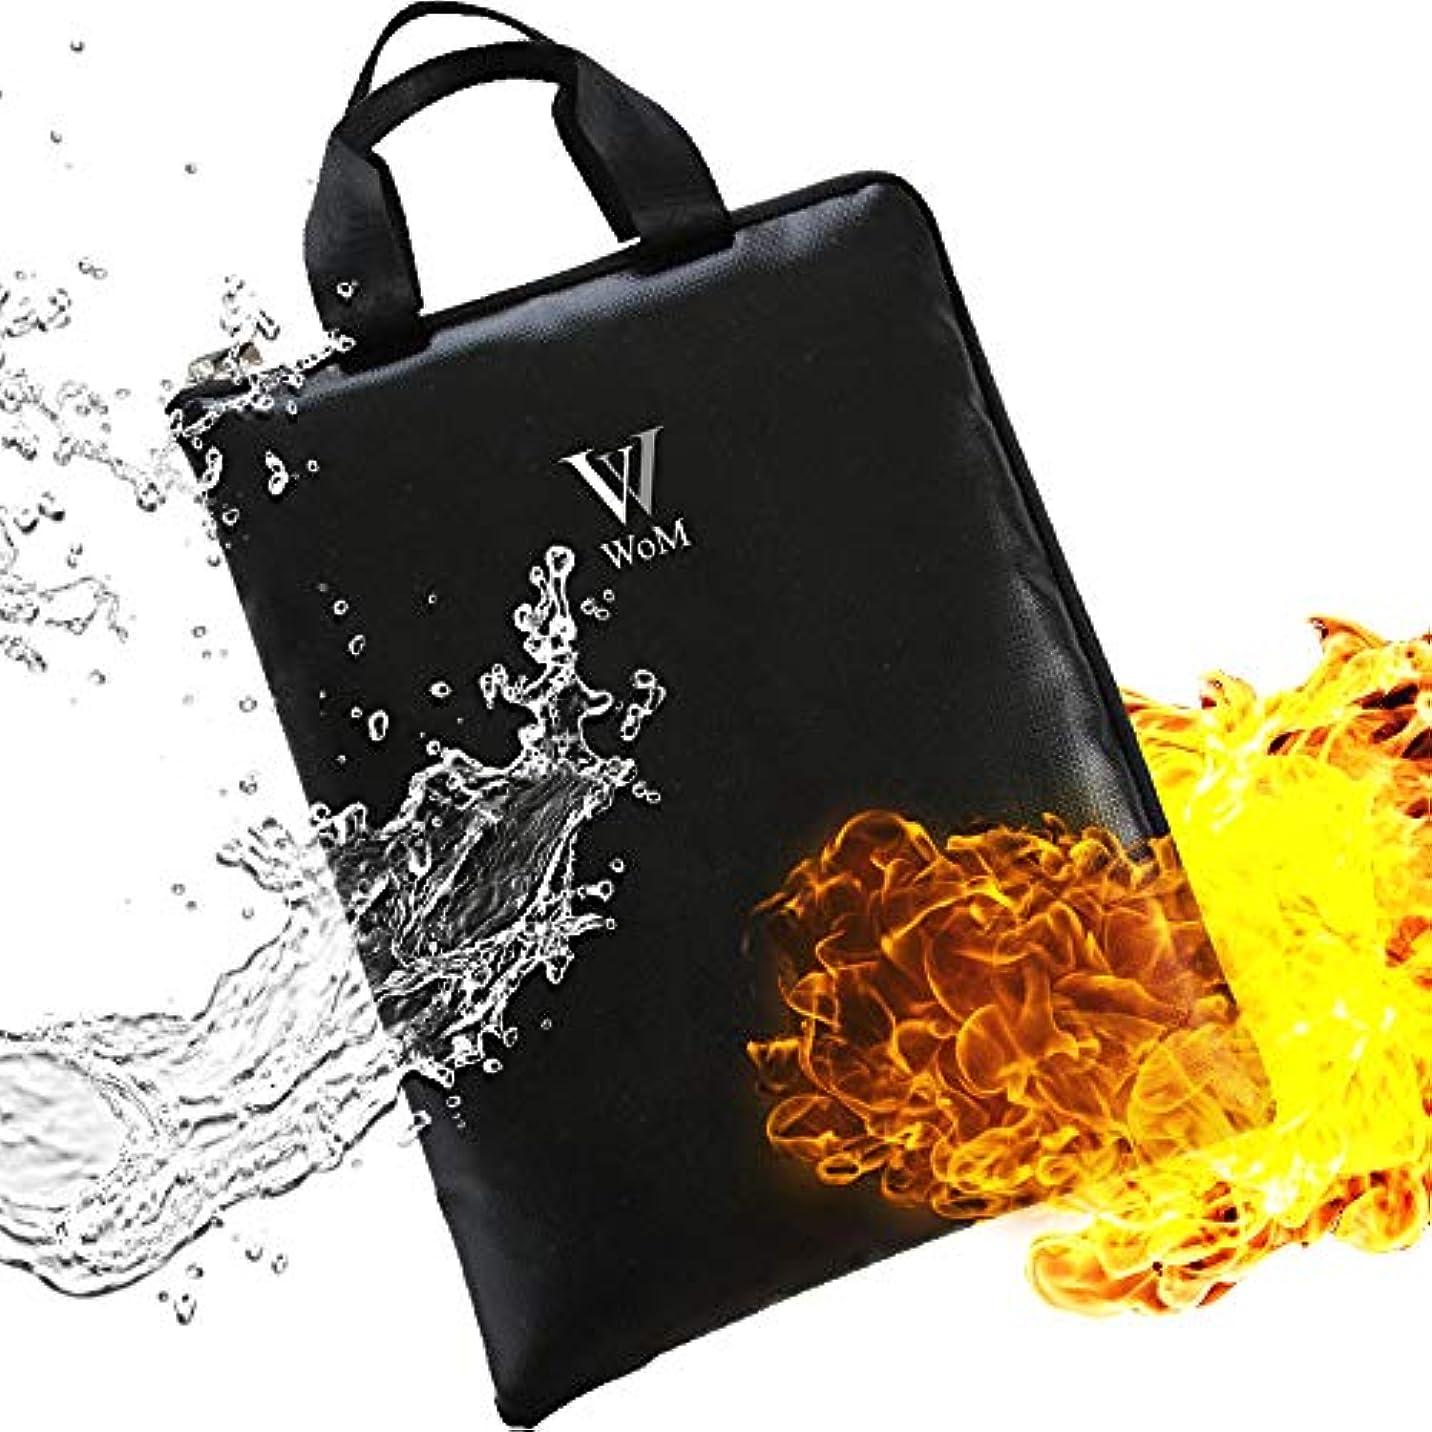 心配麦芽規則性耐火バッグ WoM 優れた耐火性 耐火 袋 家庭用 金庫 耐火金庫 現金収納ケース 書類保管ケース 手提げ 防水 小型